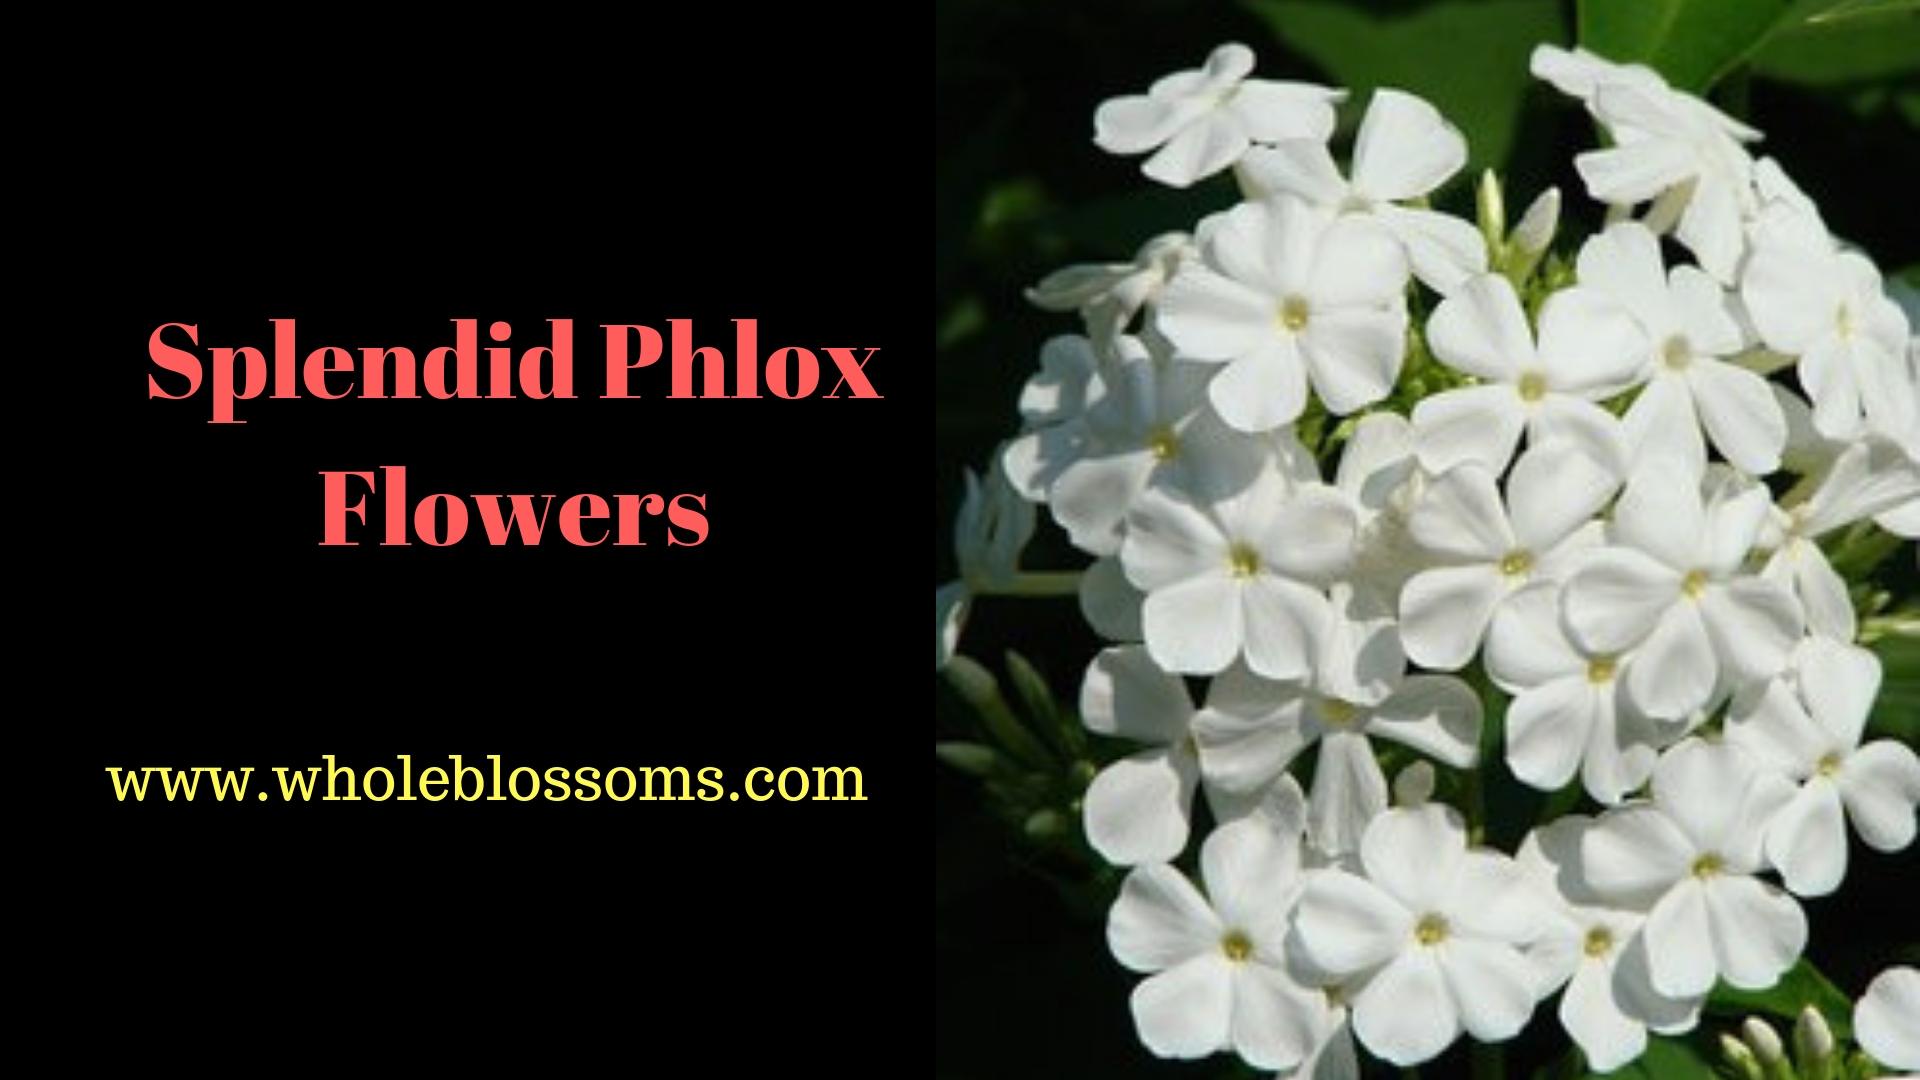 Buy Premium & High Quality of Fresh Cut Phlox